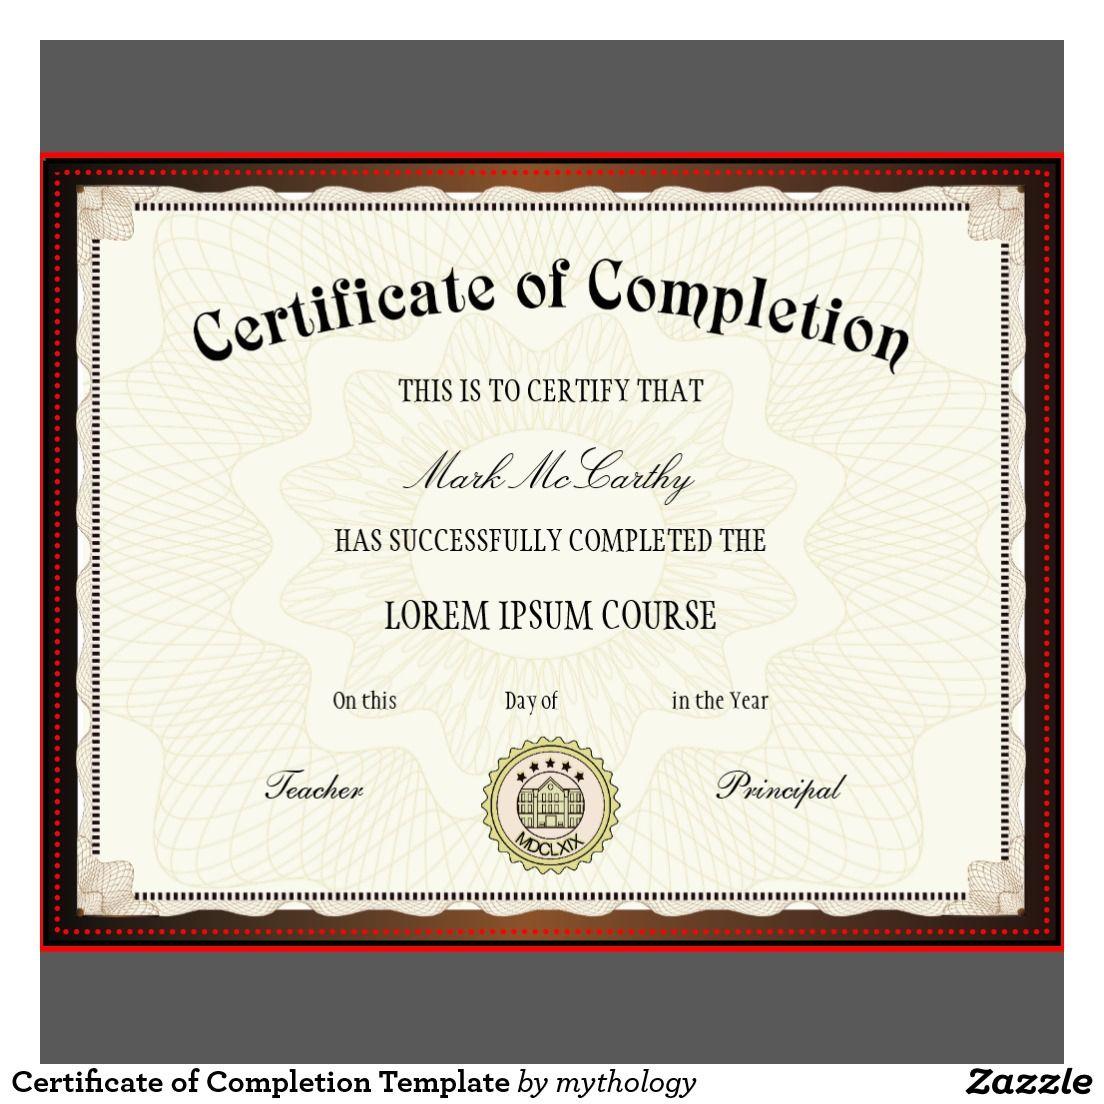 Free Printable Certificates Certificate Templates Certificate Of Completion Template Certificate Of Achievement Template Free Printable Certificate Templates Certificate of free sale template